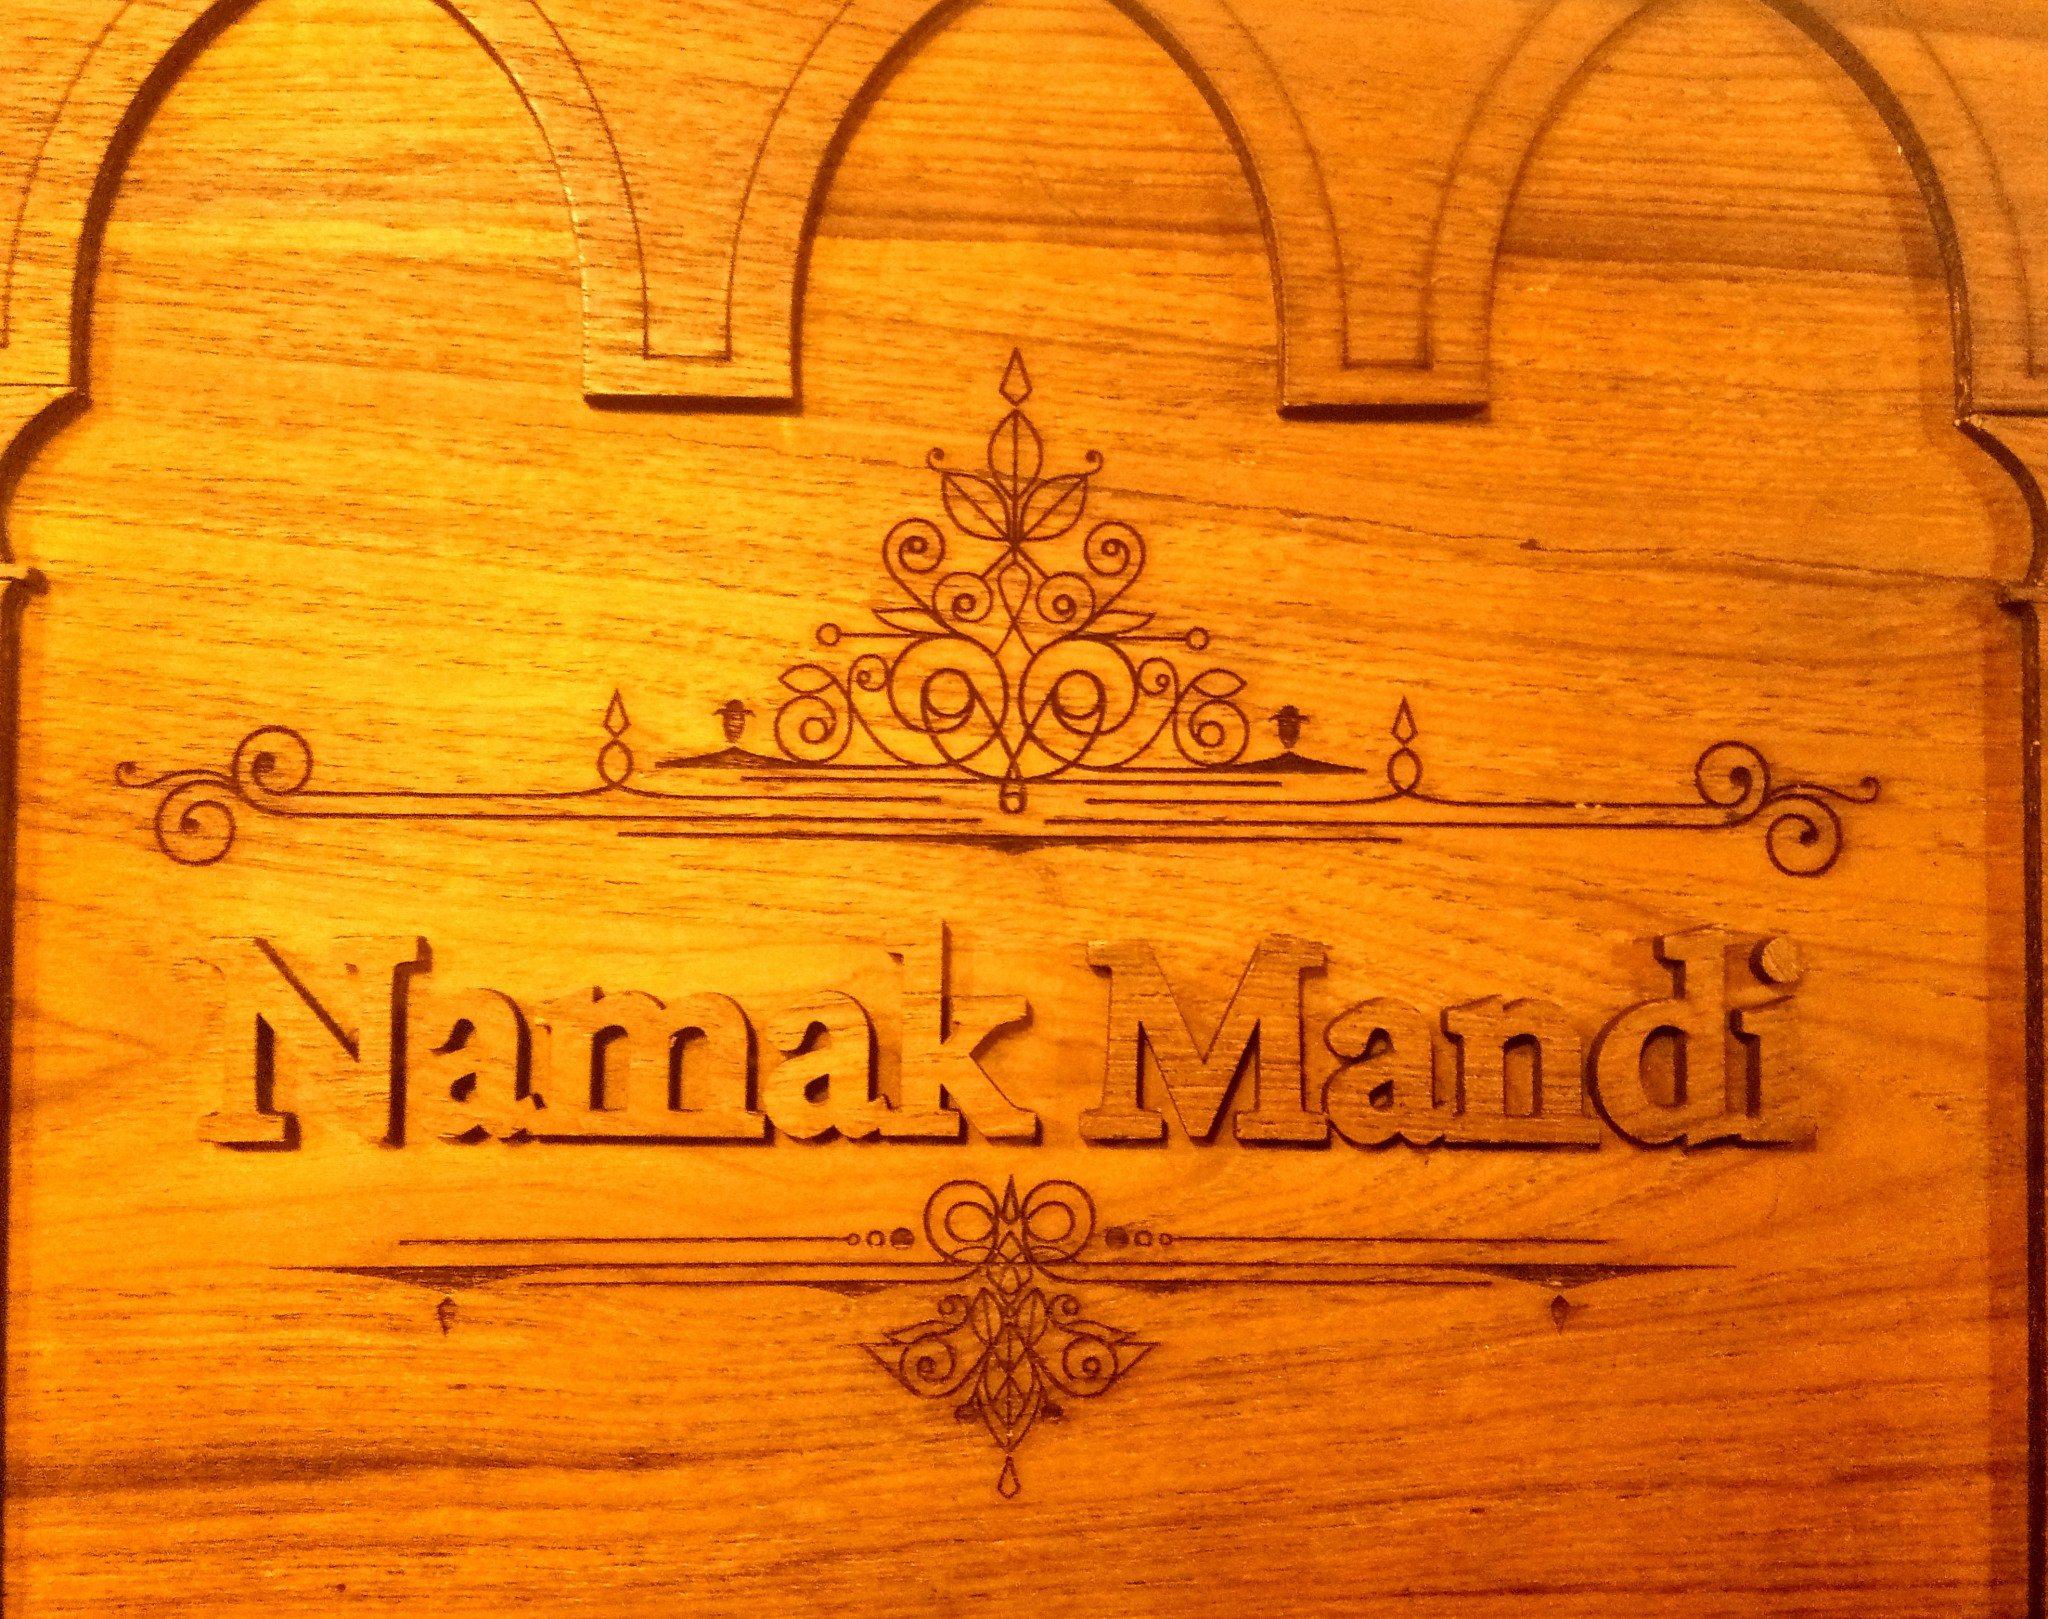 Namak Mandi